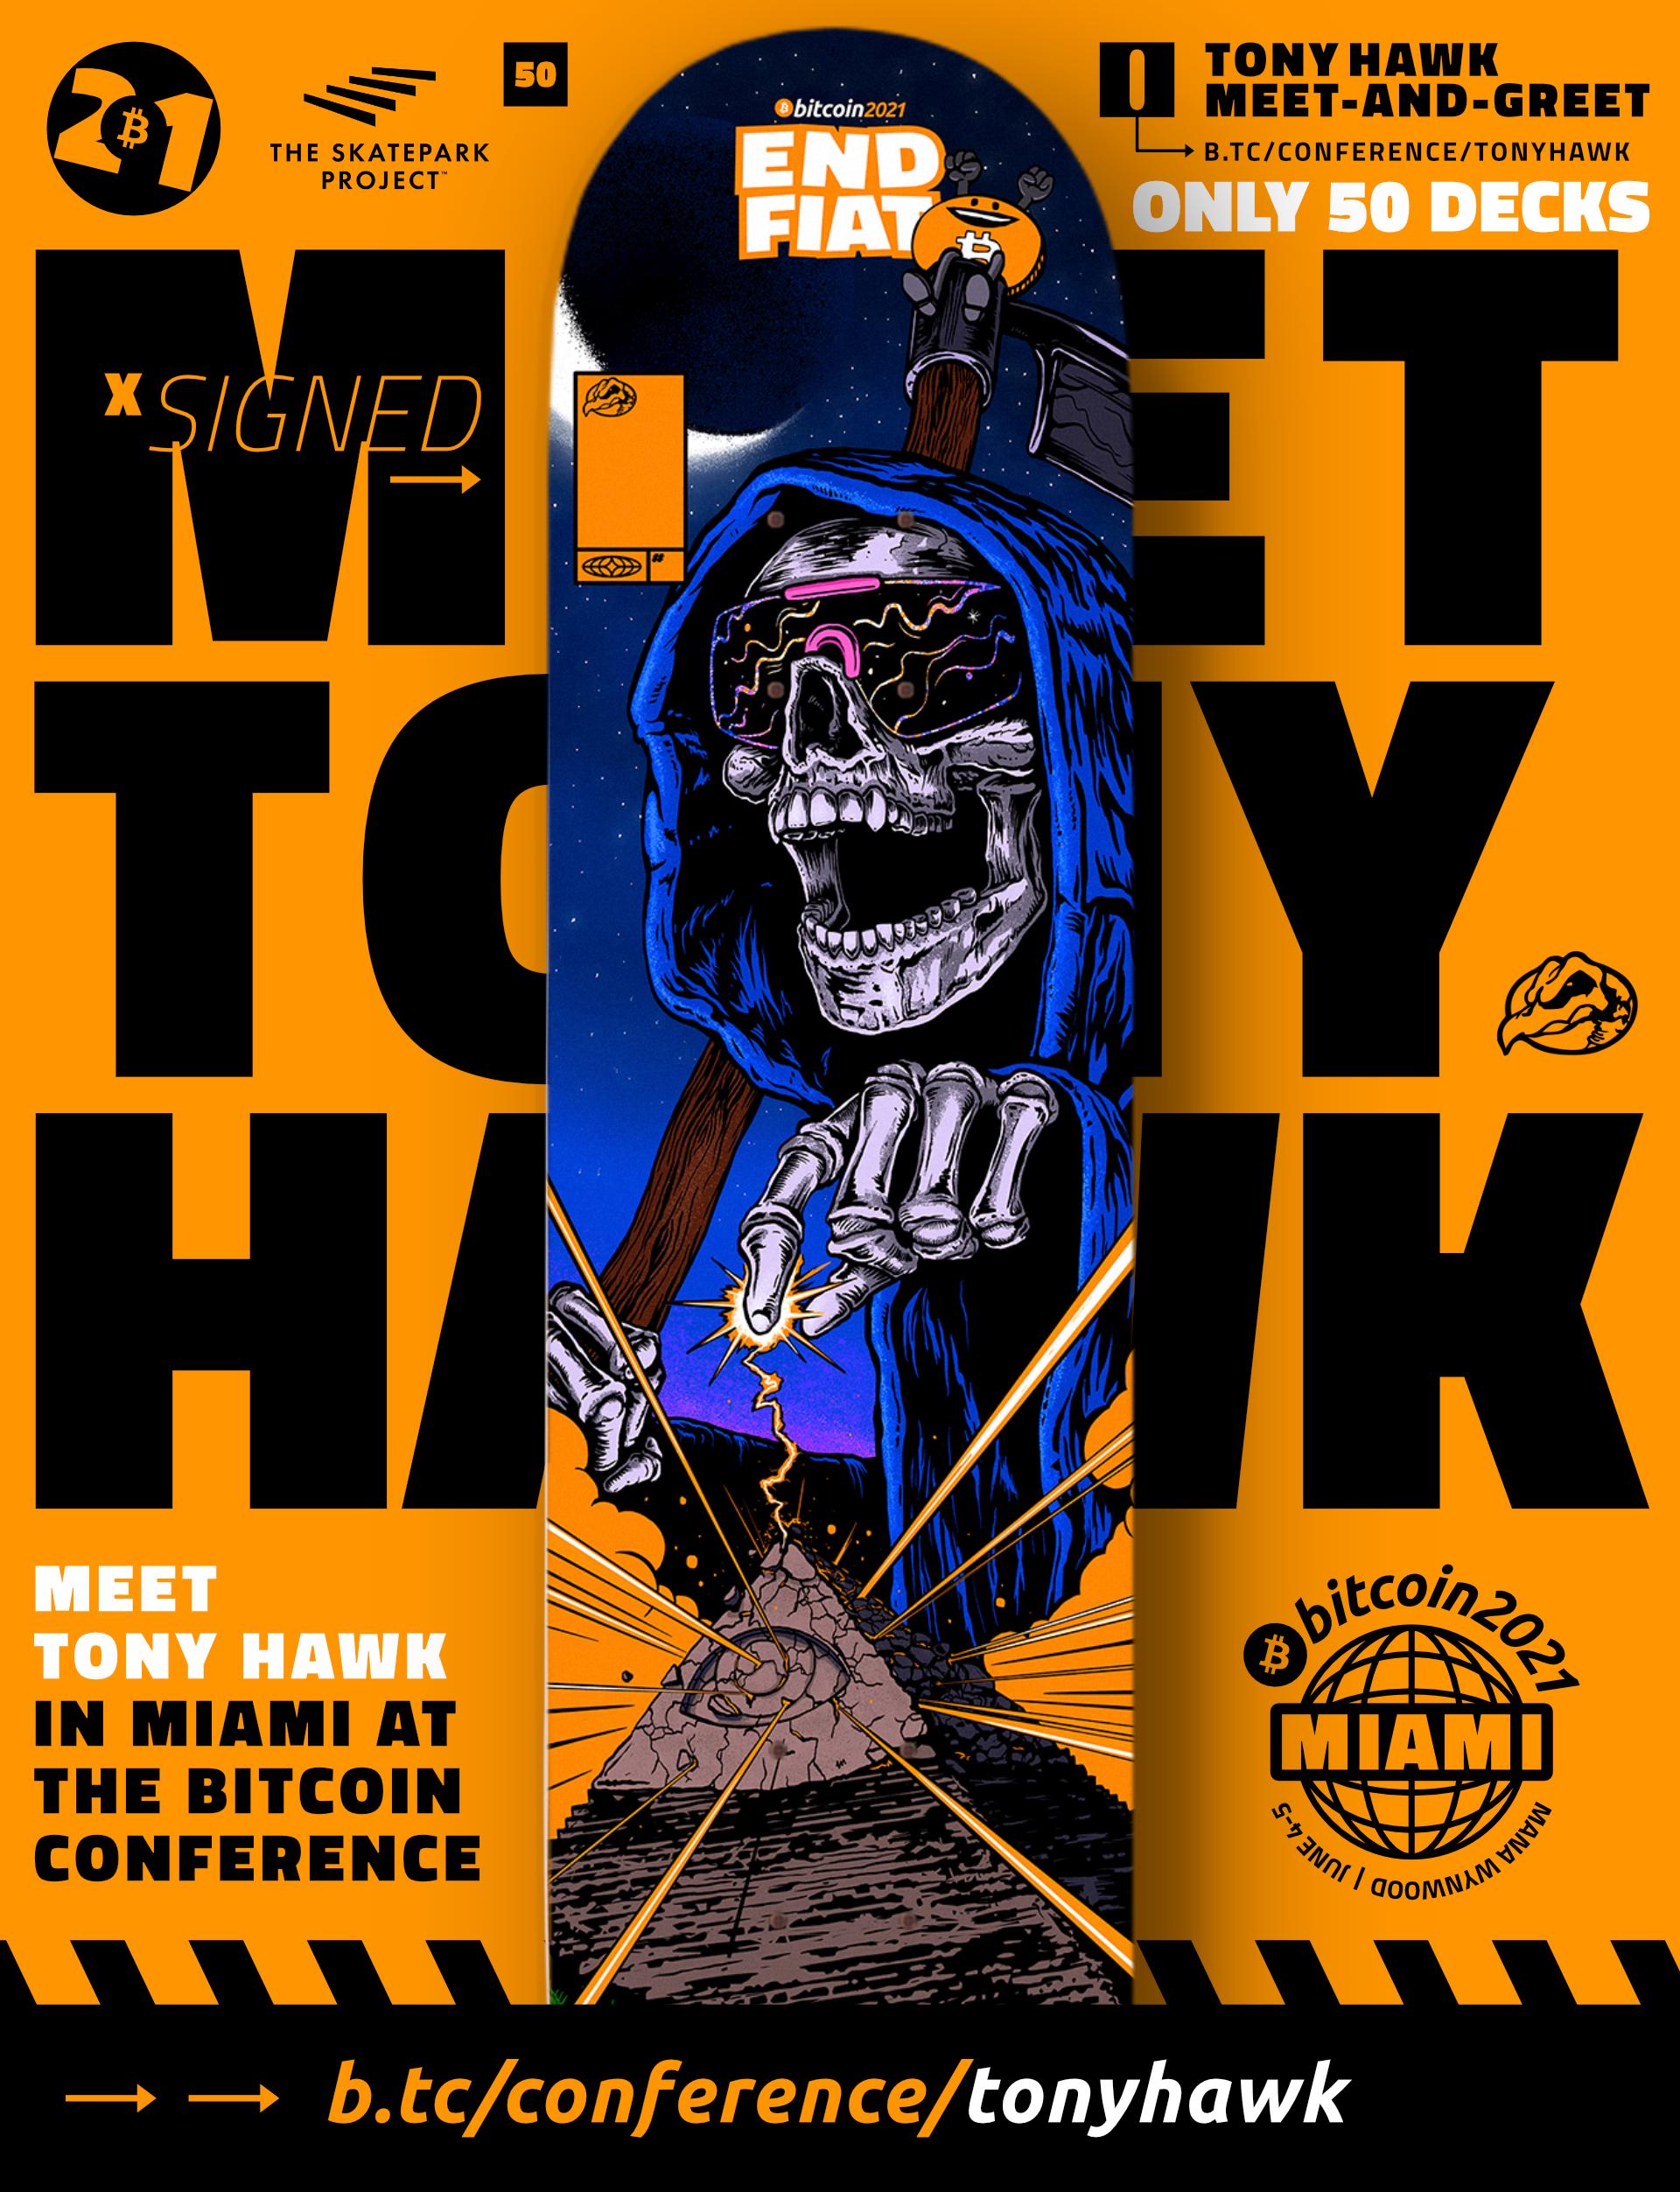 Tony Hawk Meet-and-Greet deck design | B21